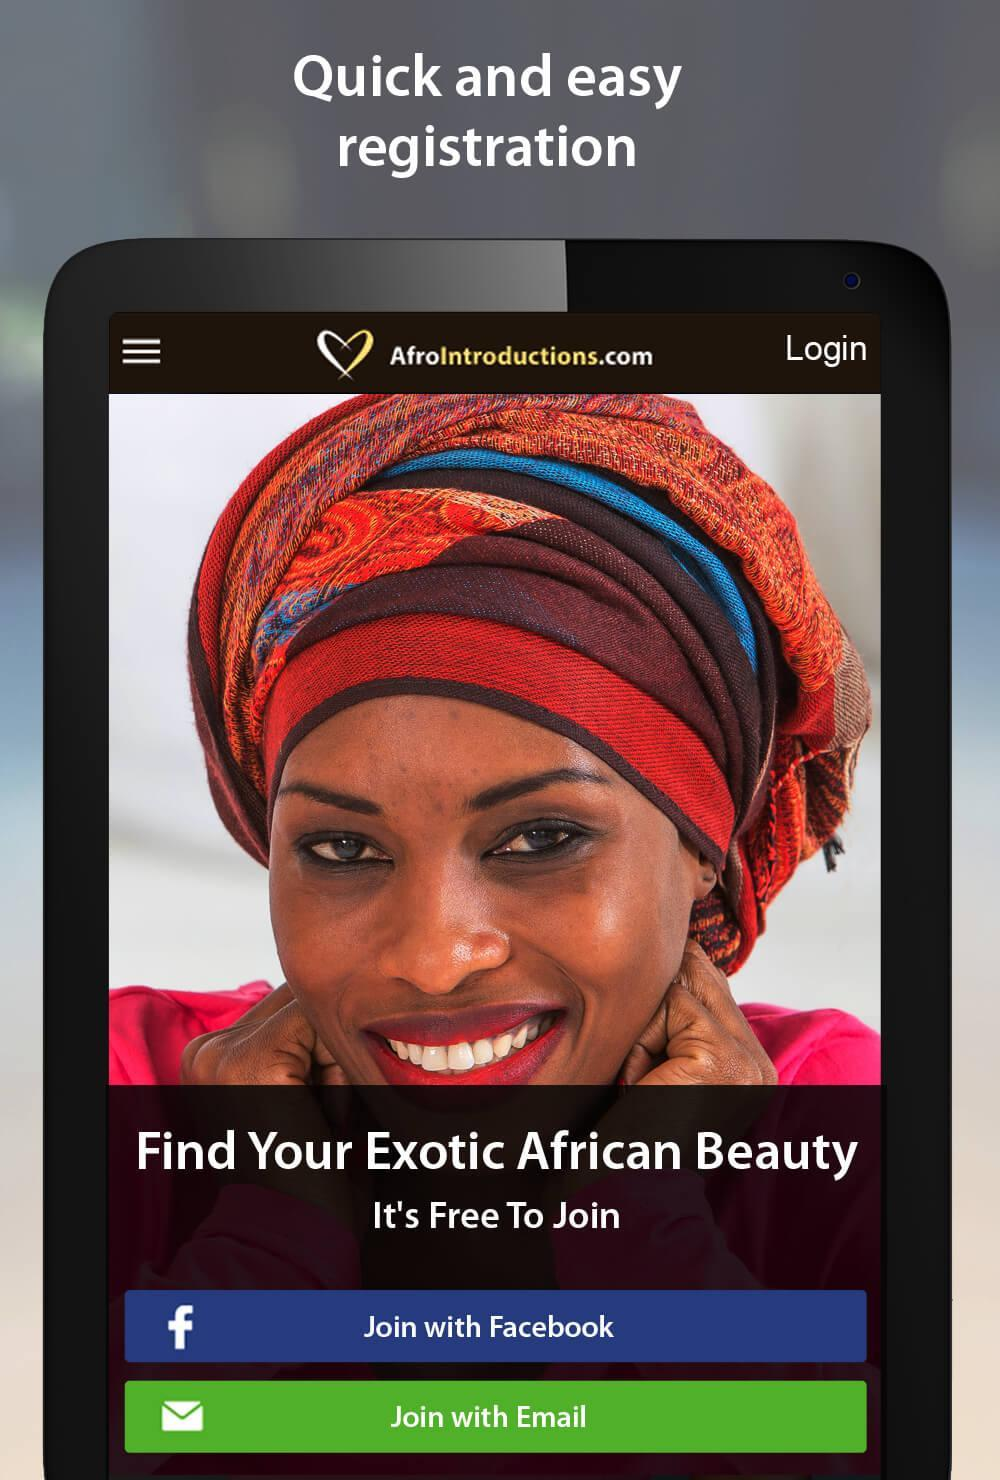 Up afrointroduction sign Afrointroduction login